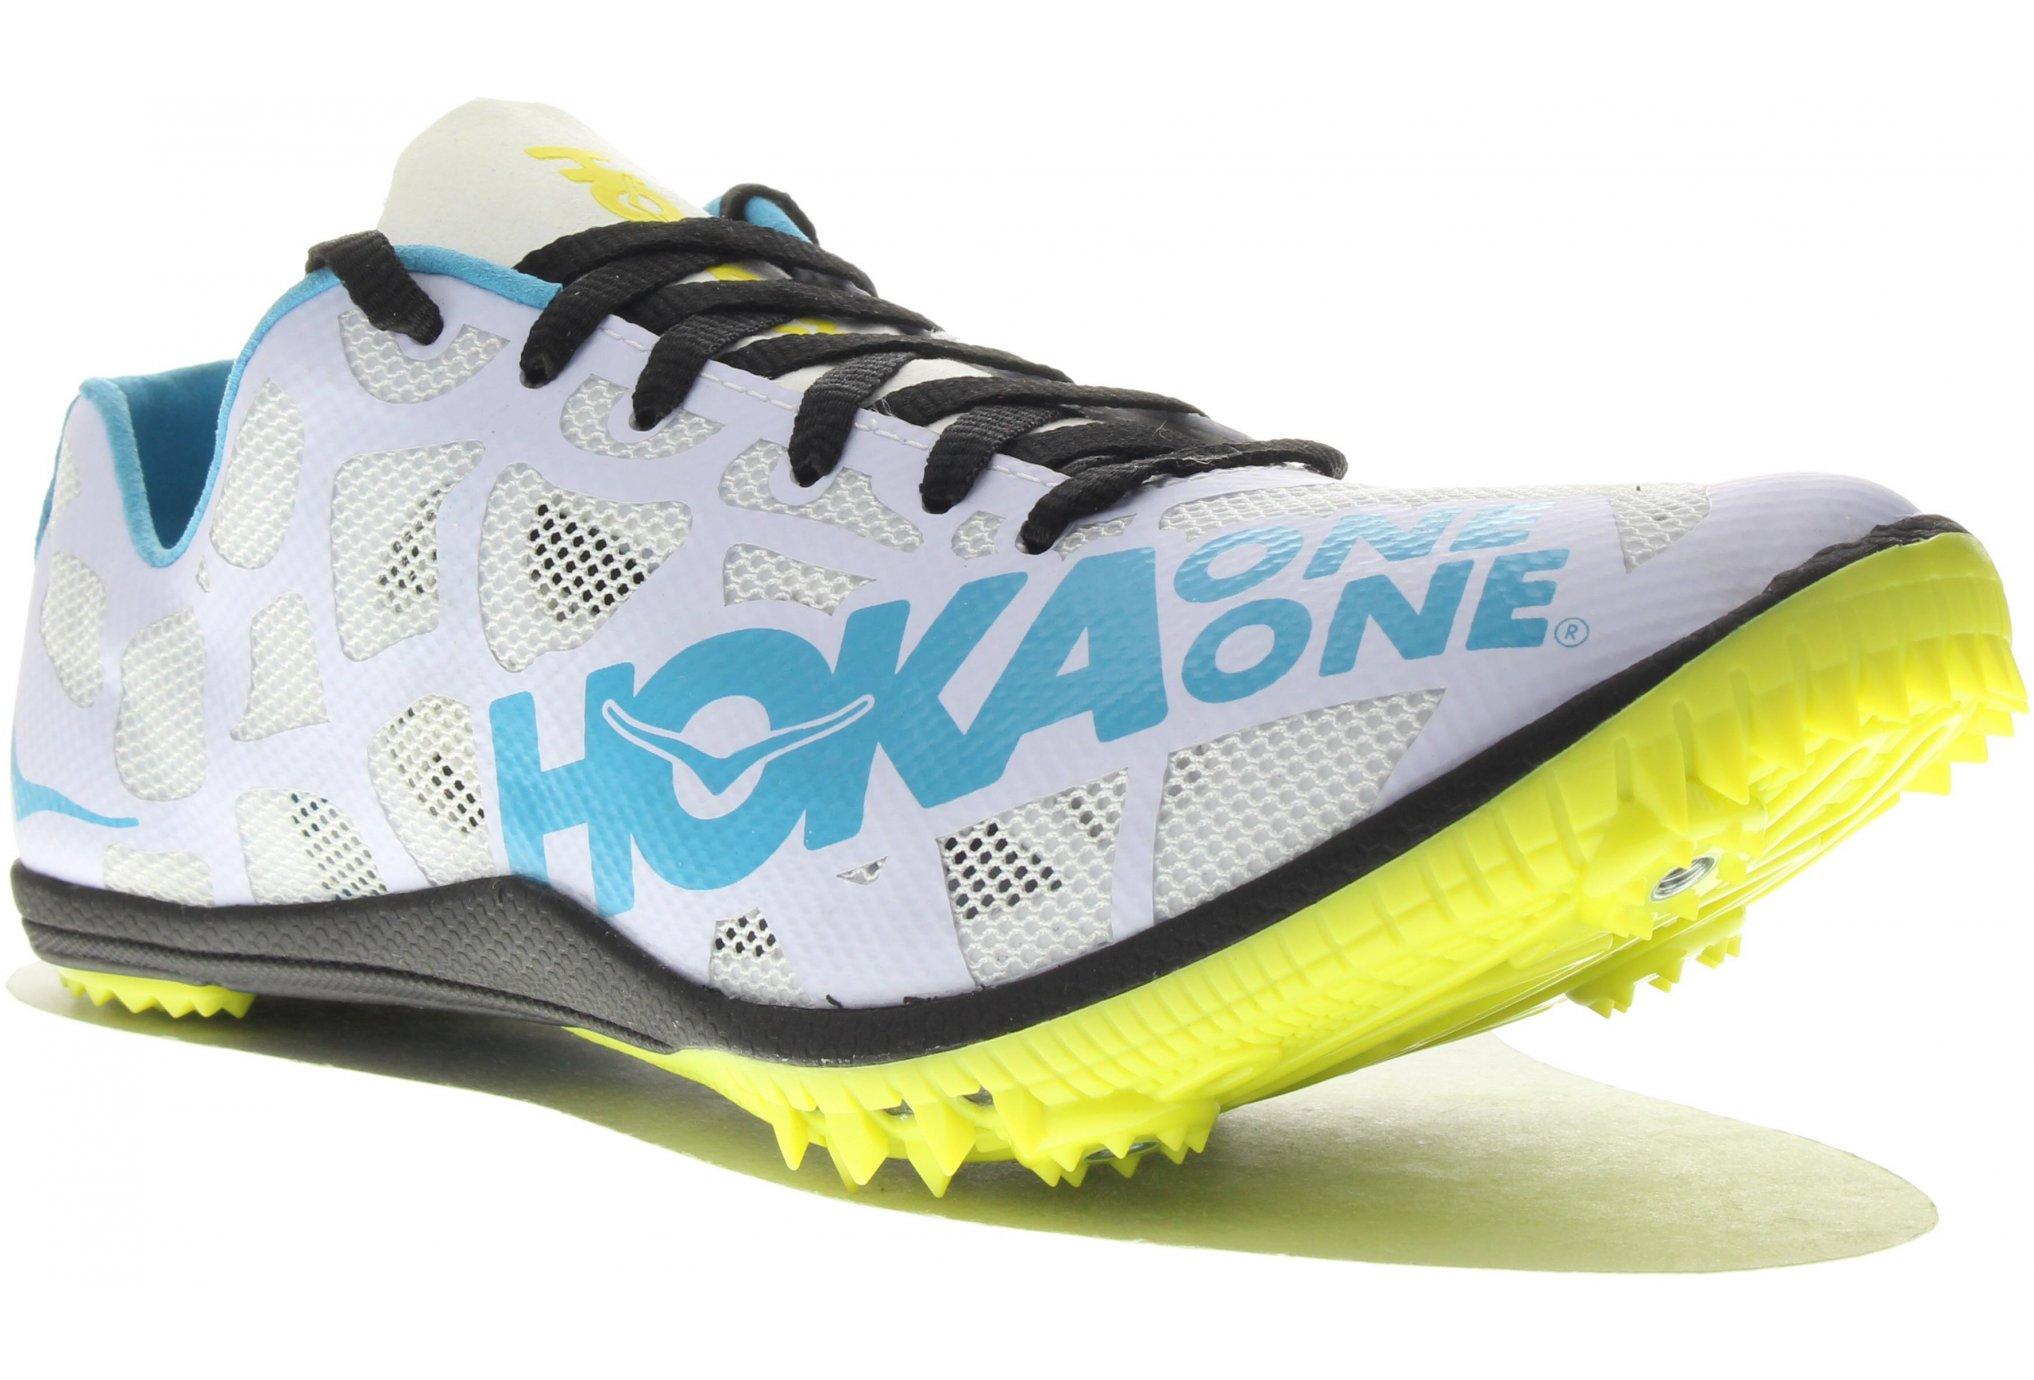 Hoka One One Rocket MD W Diététique Chaussures femme